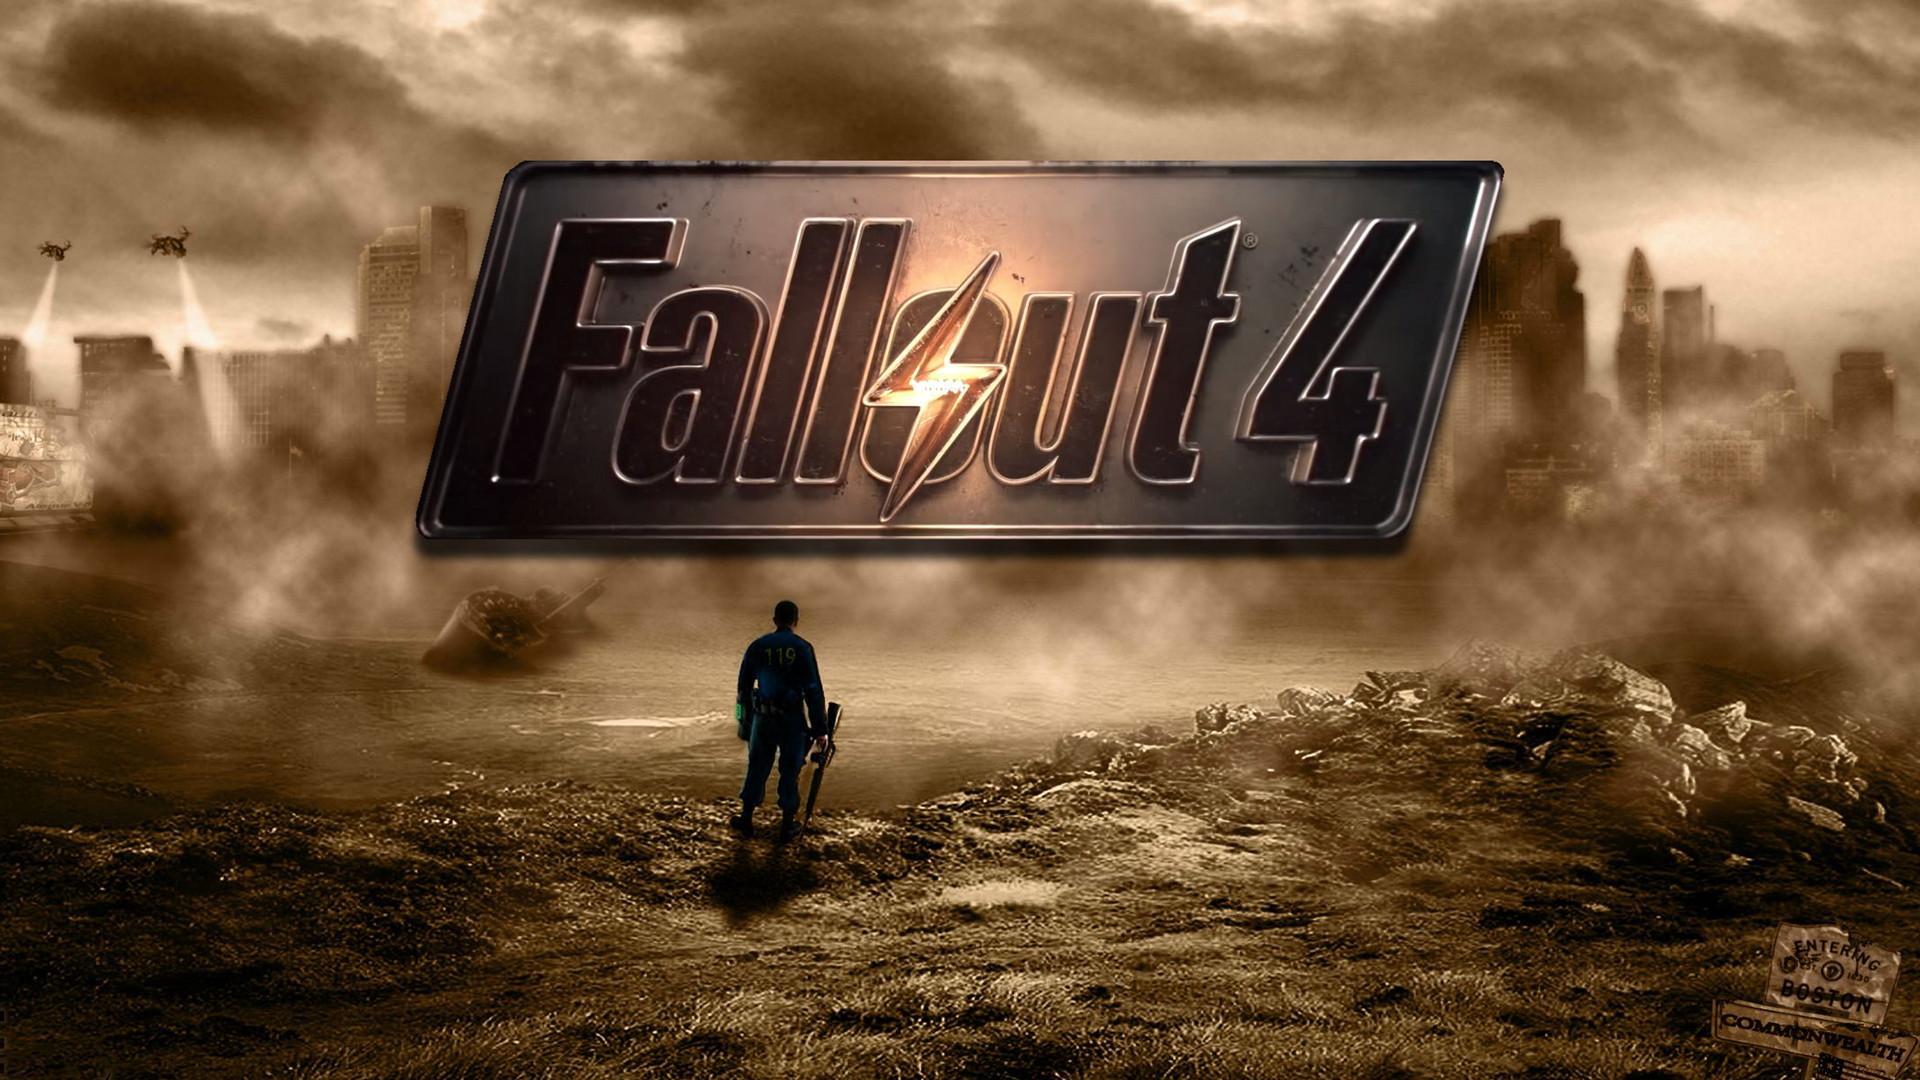 Great Wallpaper Logo Fallout 4 - latest?cb\u003d20160323154322  2018_712215.jpg/revision/latest?cb\u003d20160323154322